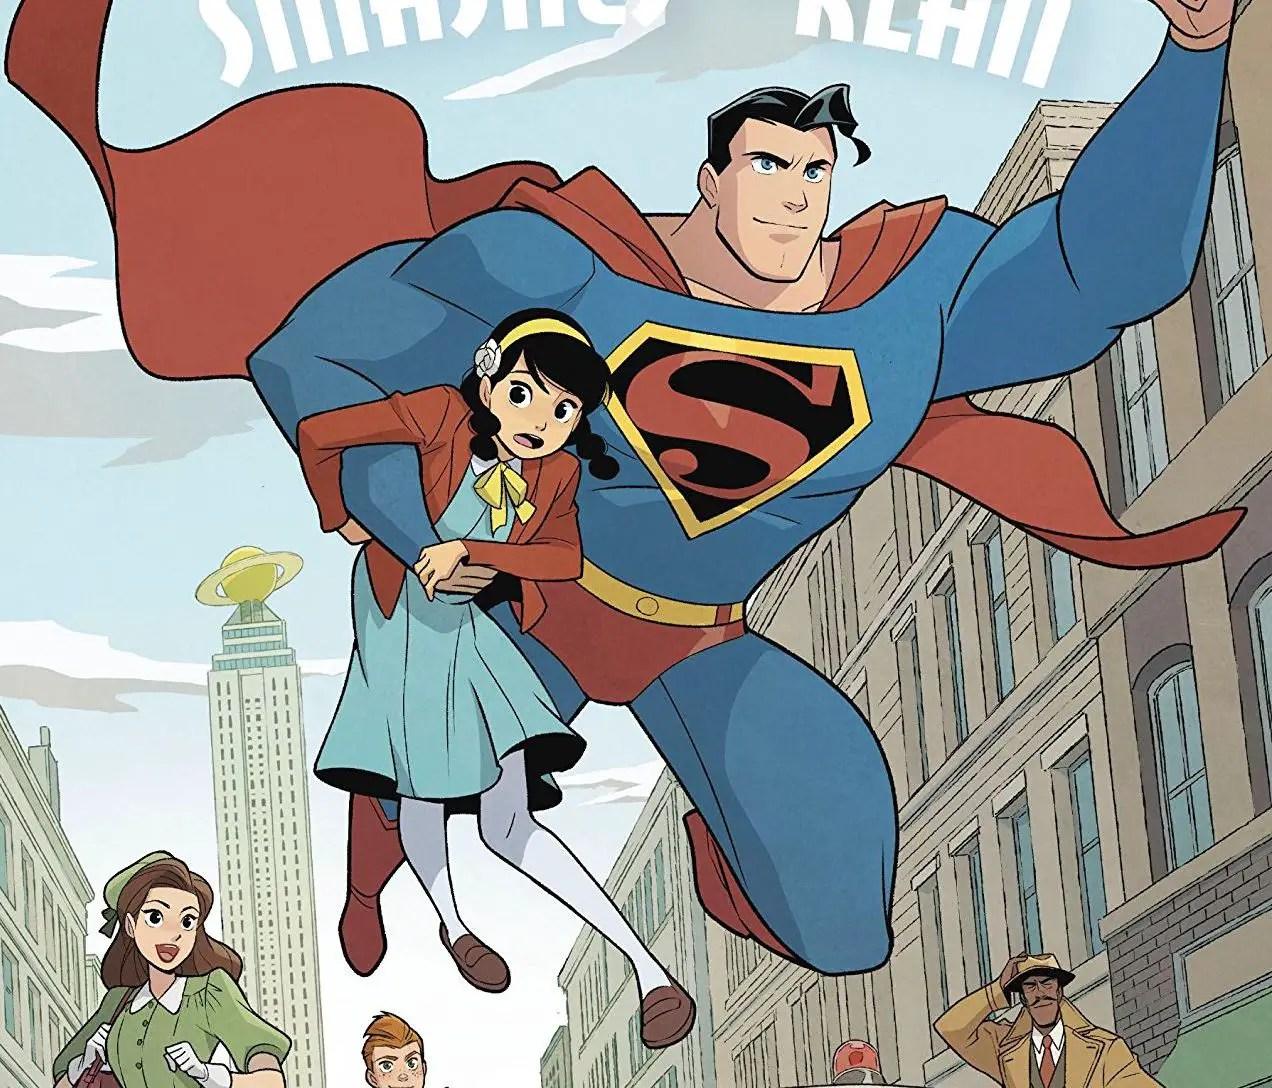 Superman Smashes the Klan #2 review: identity crisis